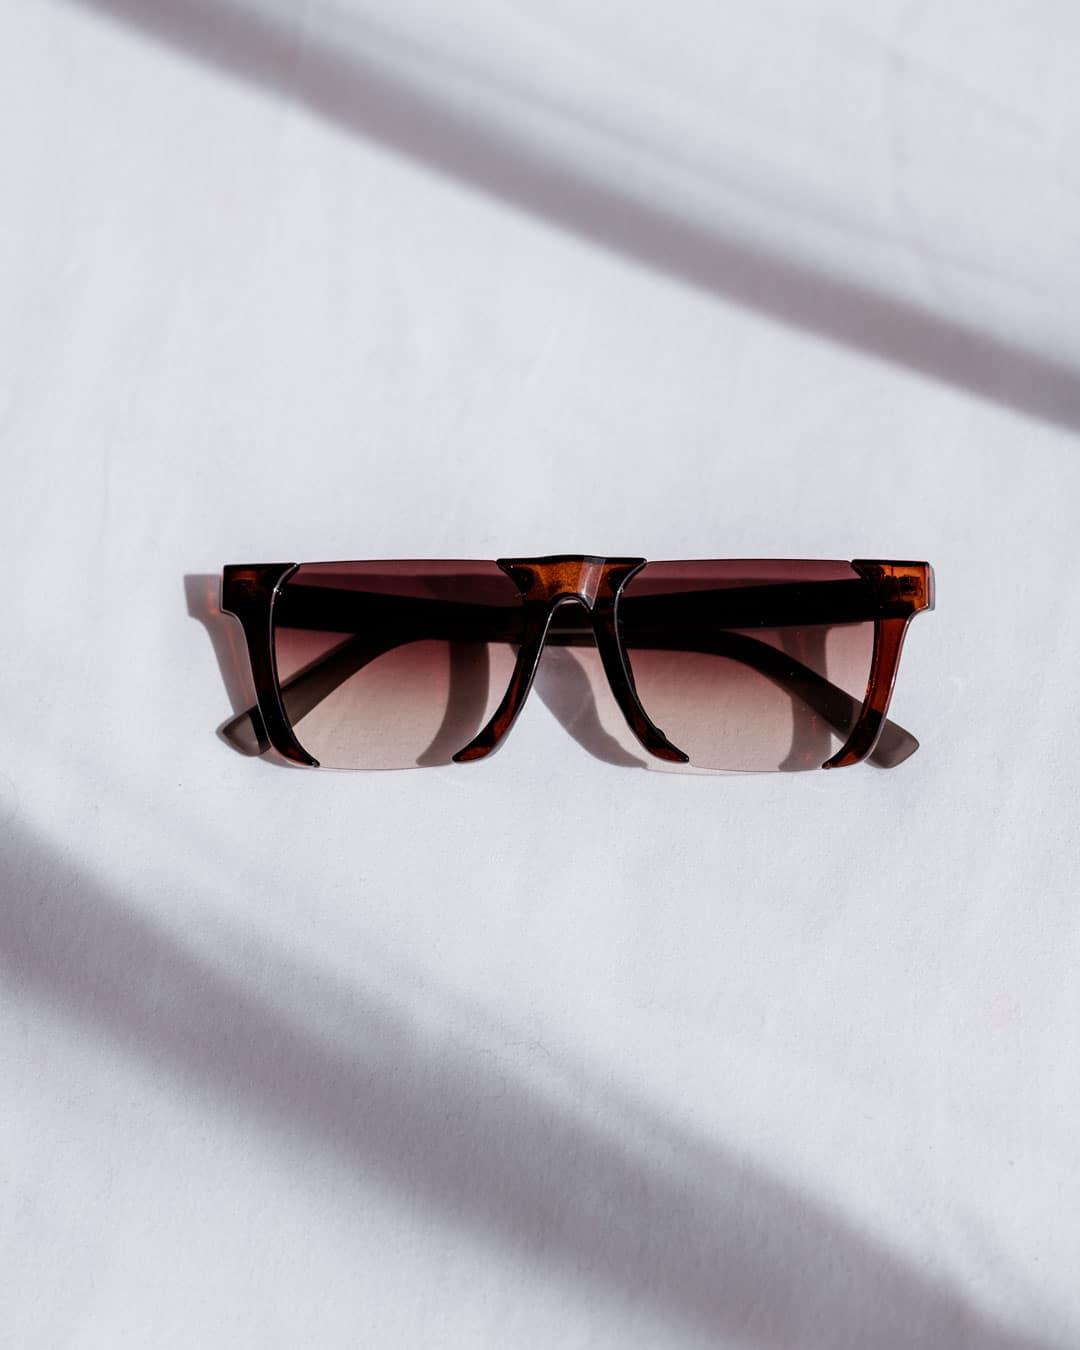 brown rimless sunglasses